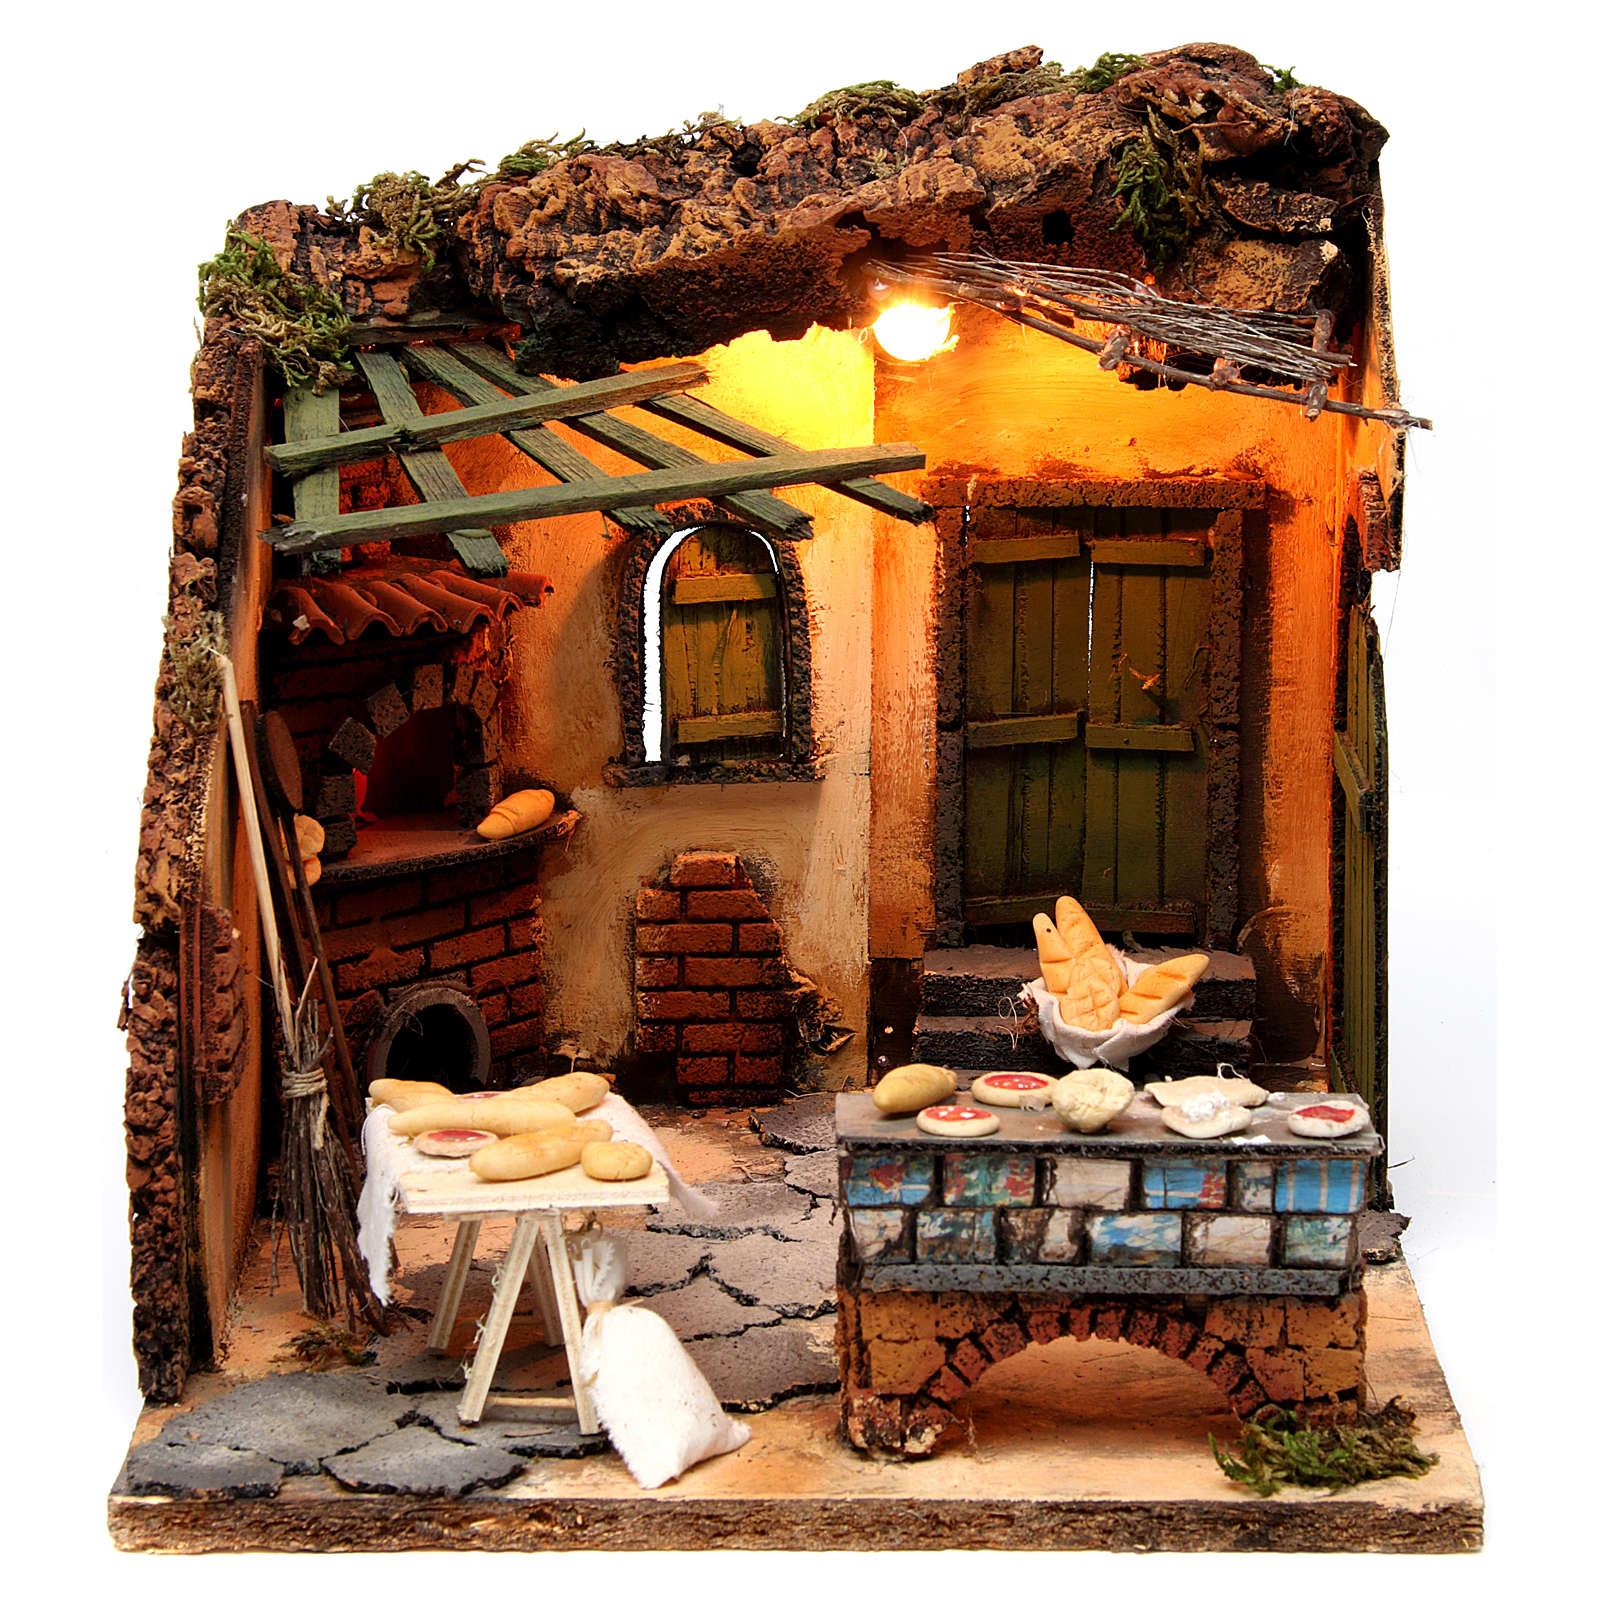 Illuminated oven scene 30x30x30 cm for Neapolitan nativity scene 4